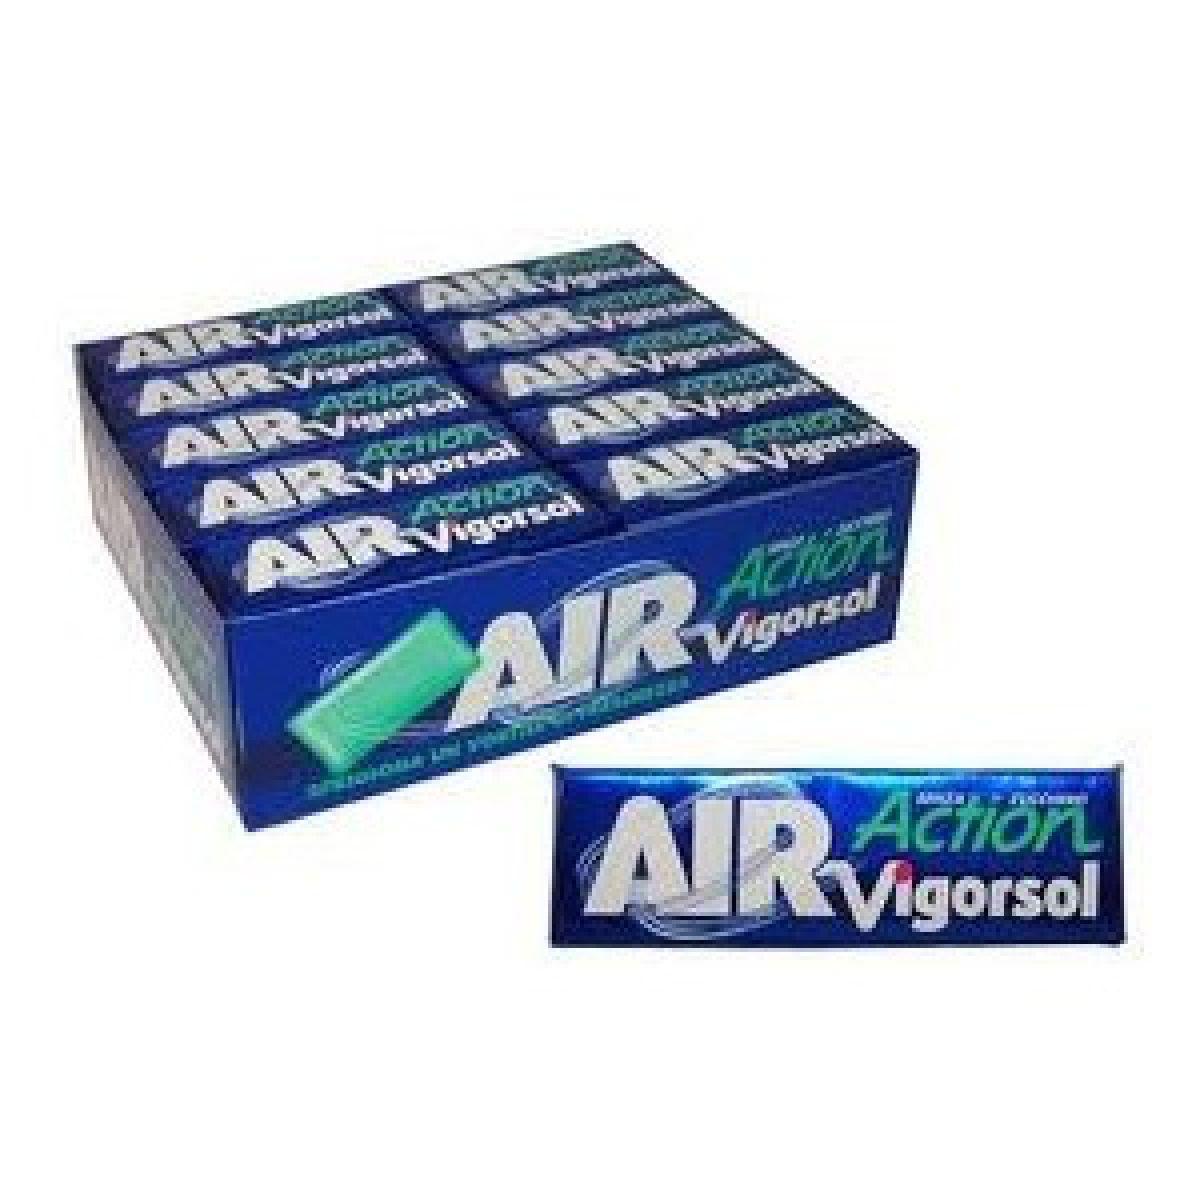 vendita VIGORSOL AIR ACTION PZ.40 BLU Perfetti Van Melle